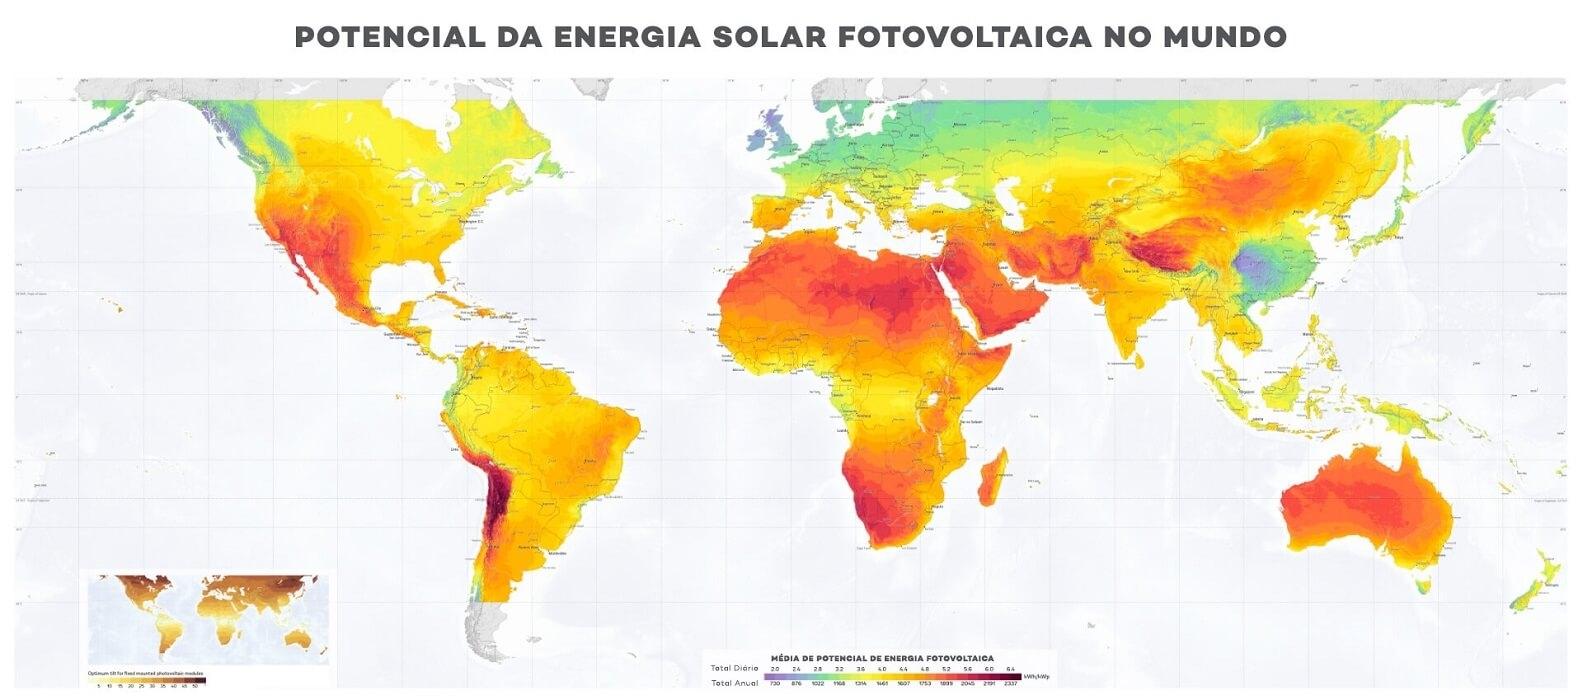 Potencial Energia Solar Fotovoltaica no Mundo